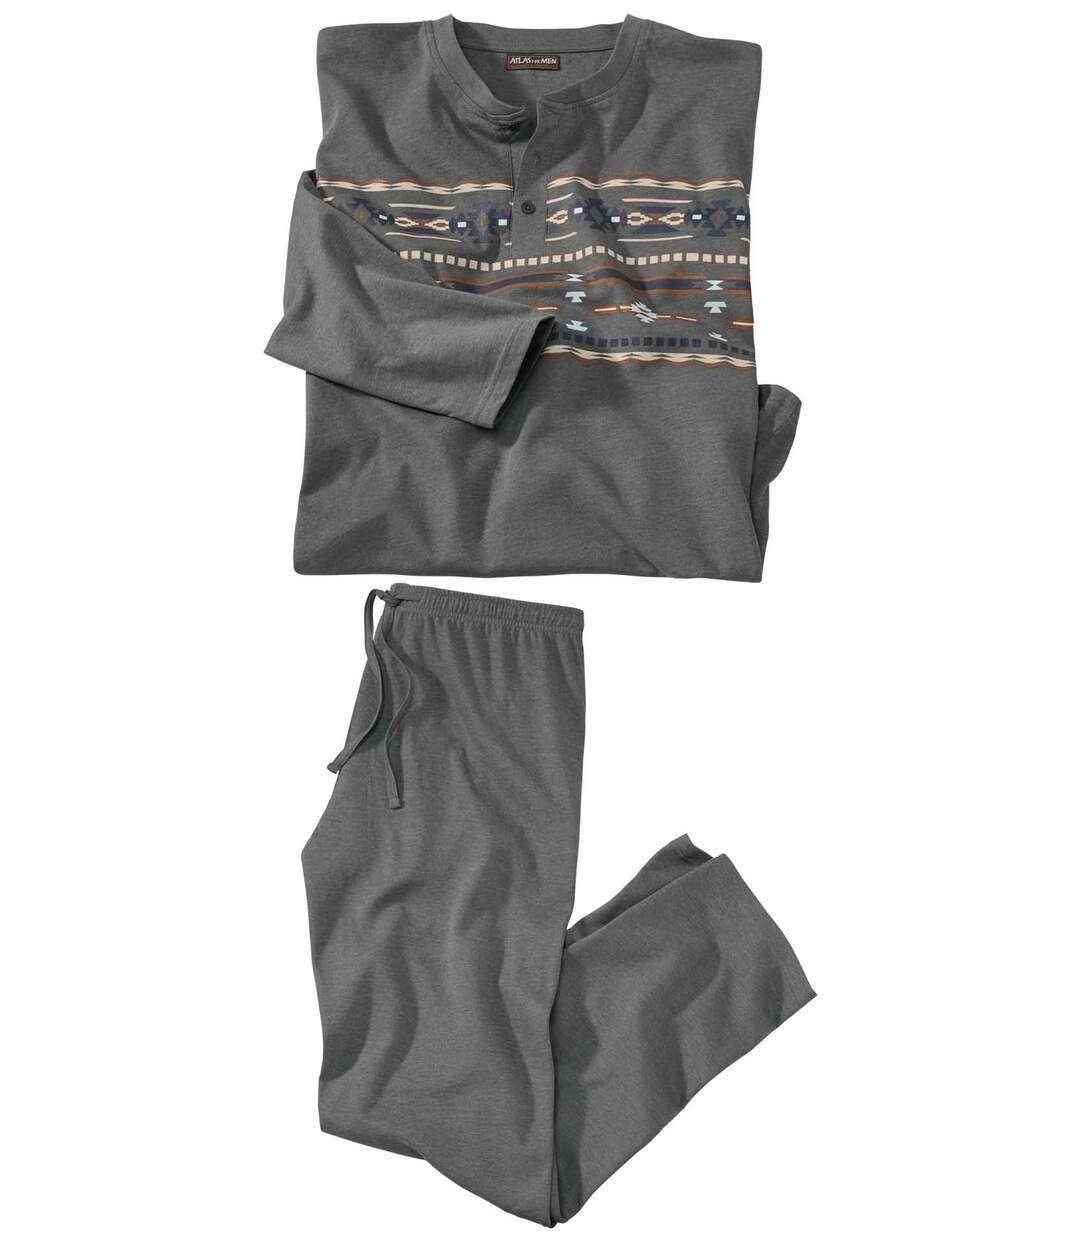 Men's Grey Feel Good Pyjamas